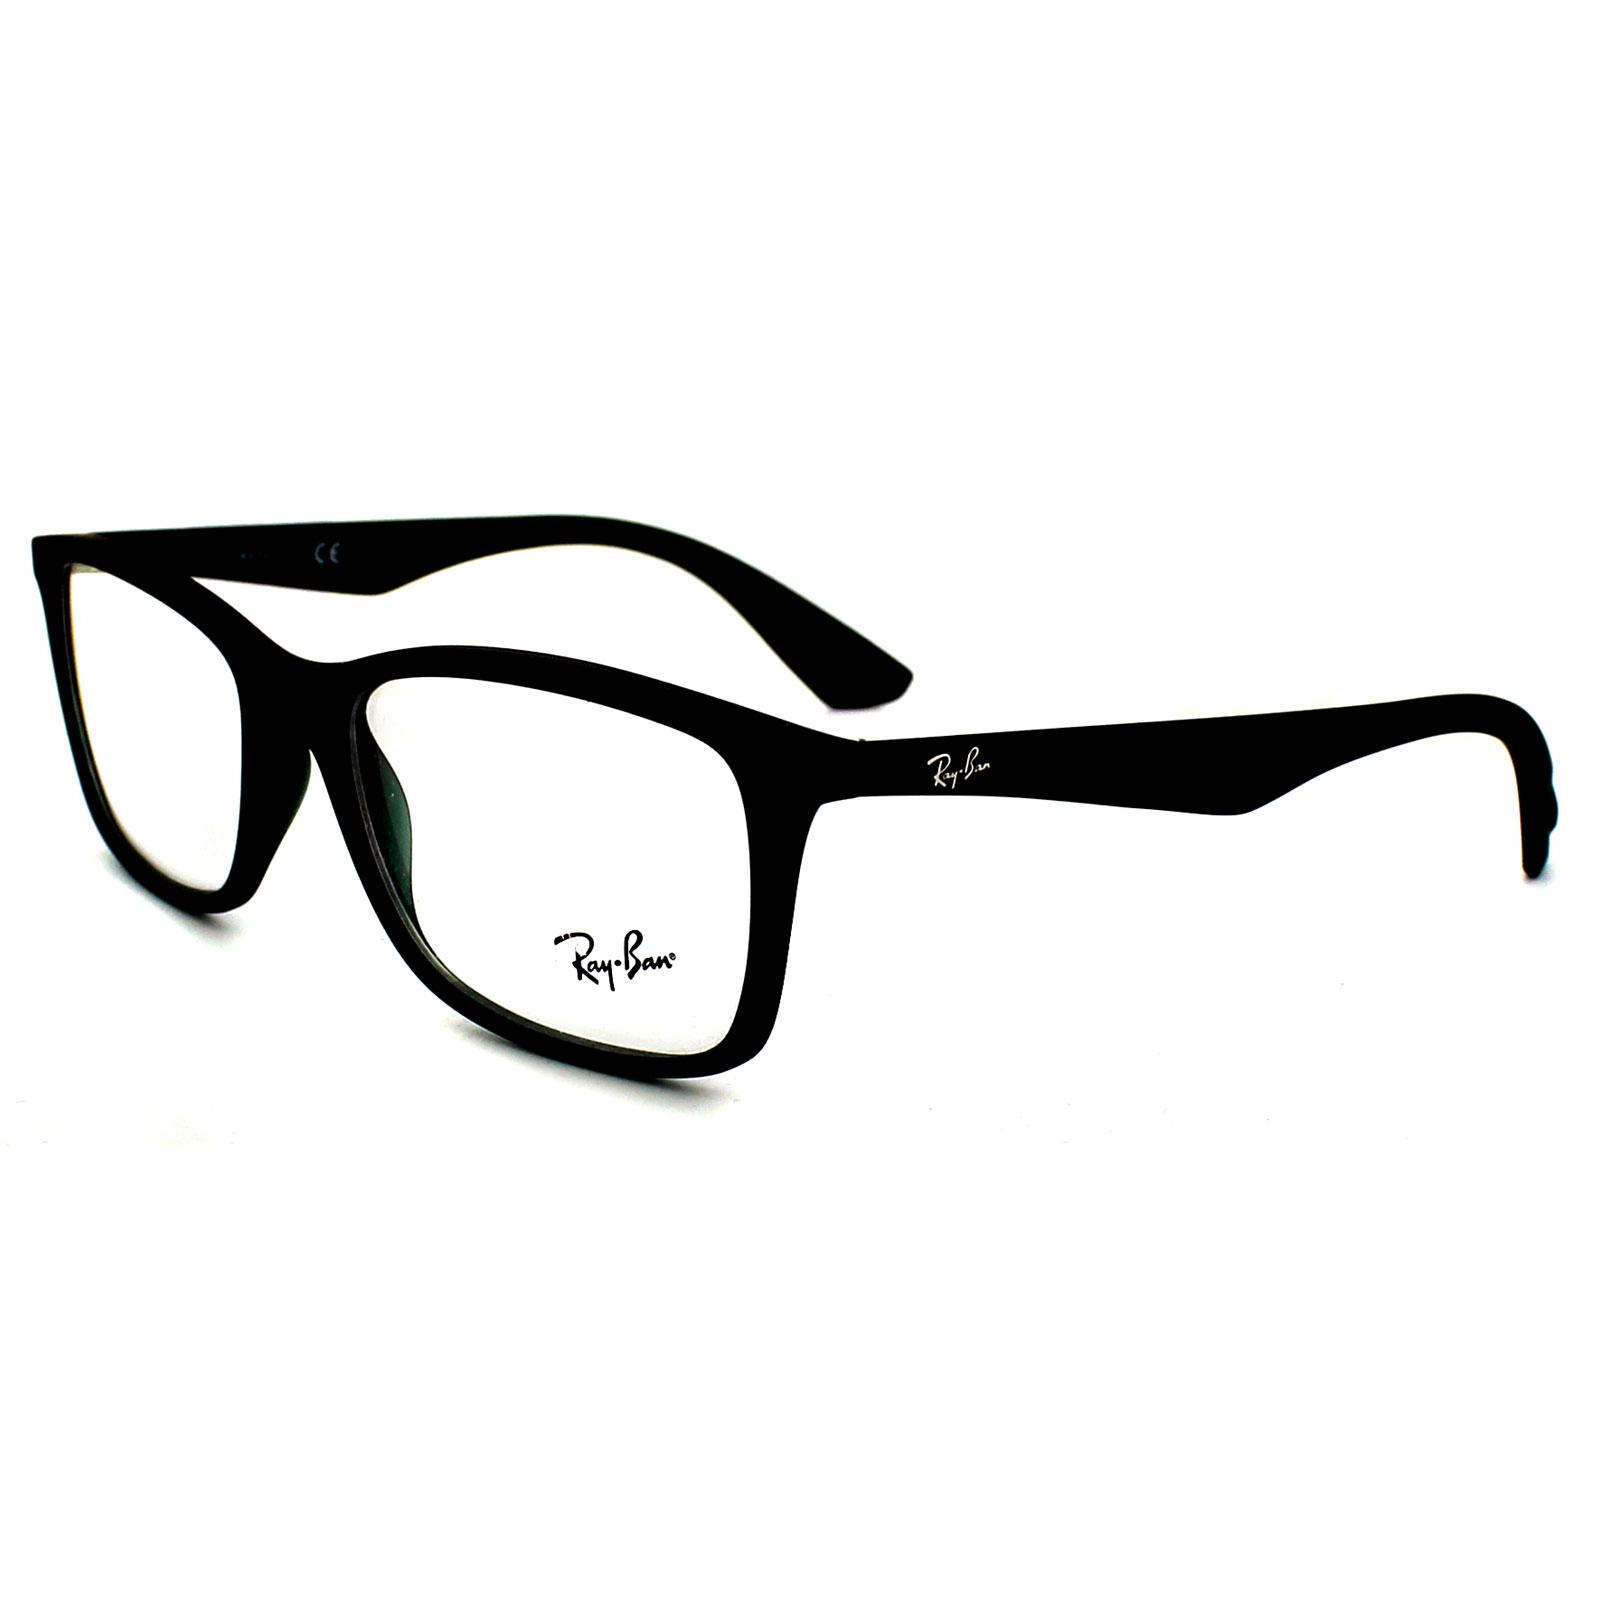 6952bd8dbe Ray Ban Clear Frame Sunglasses « Heritage Malta